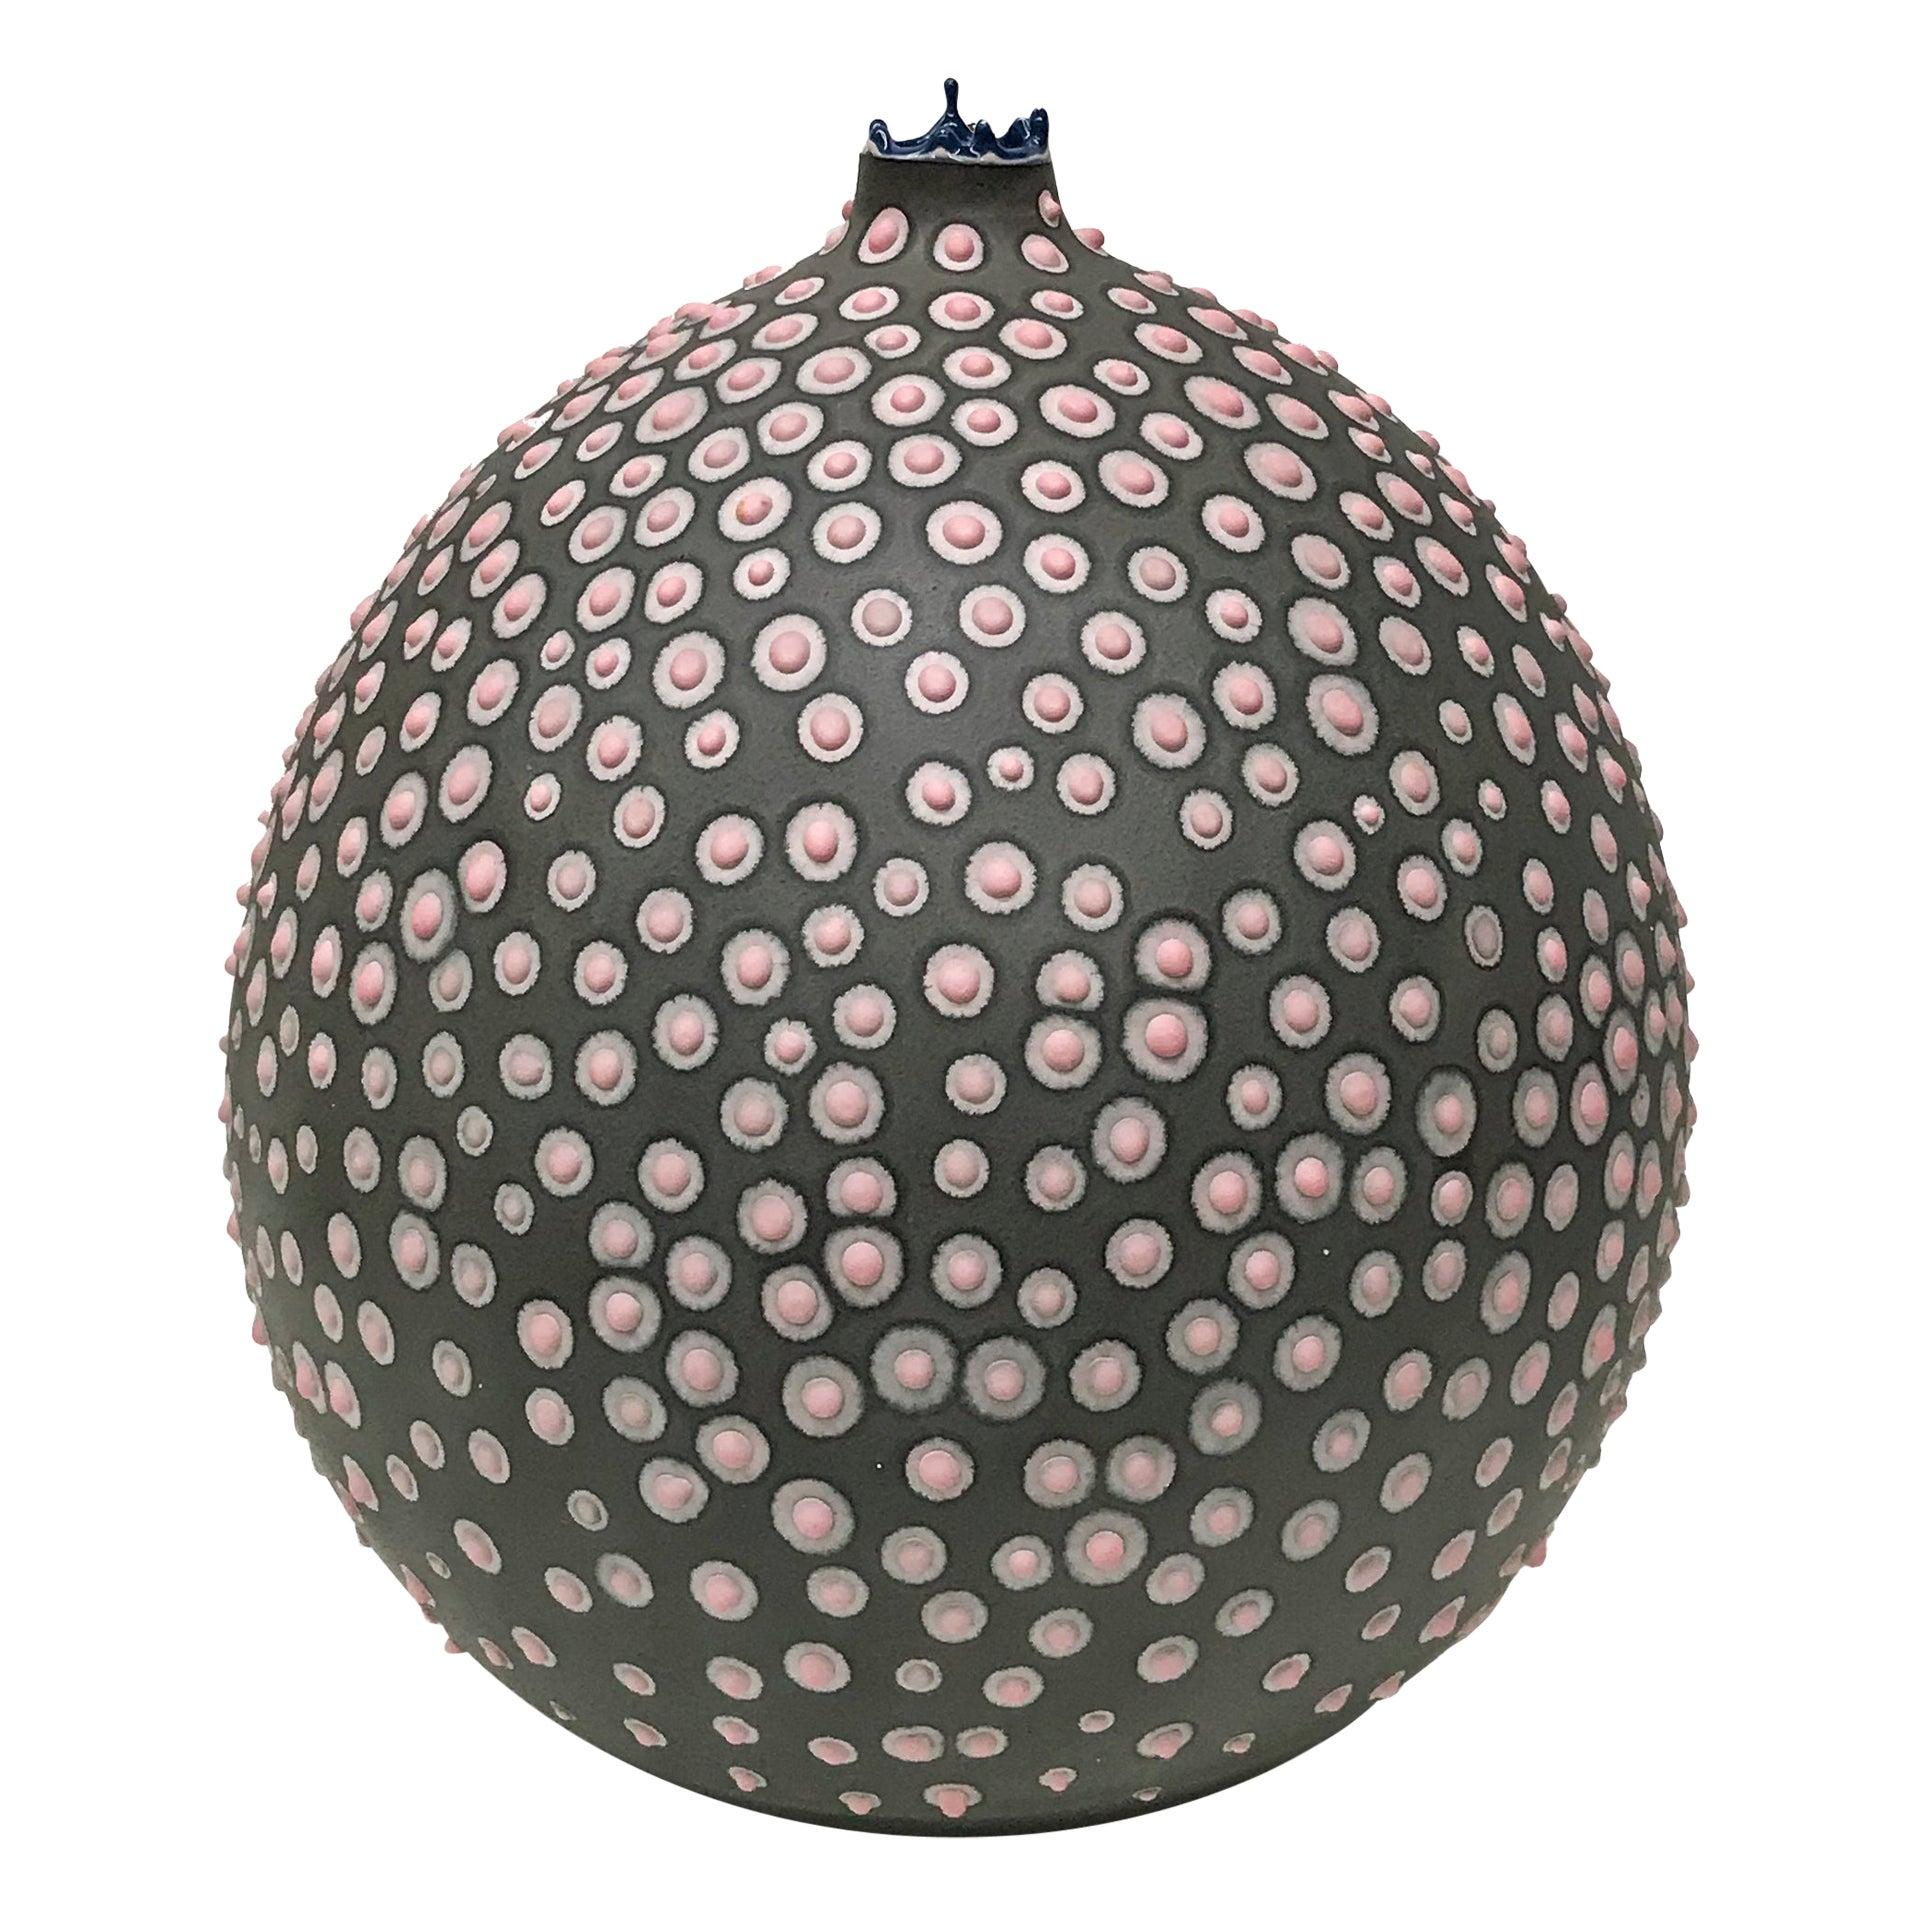 Unique Handmade 21st Century Medium Round Vase in Gray and Pink by Elyse Graham